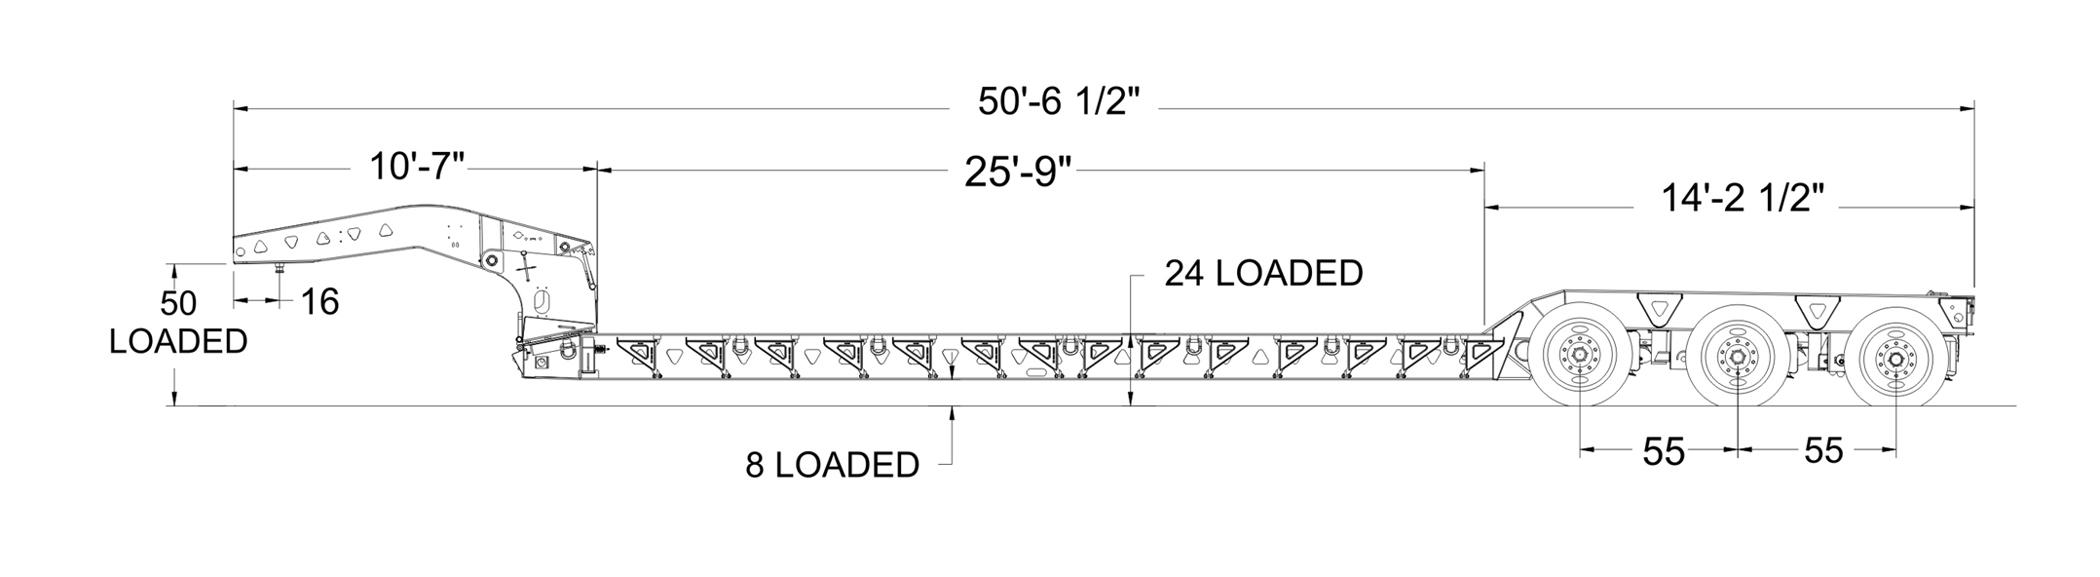 Trail King Advantage Plus! HDG Hydraulic Detachable Gooseneck